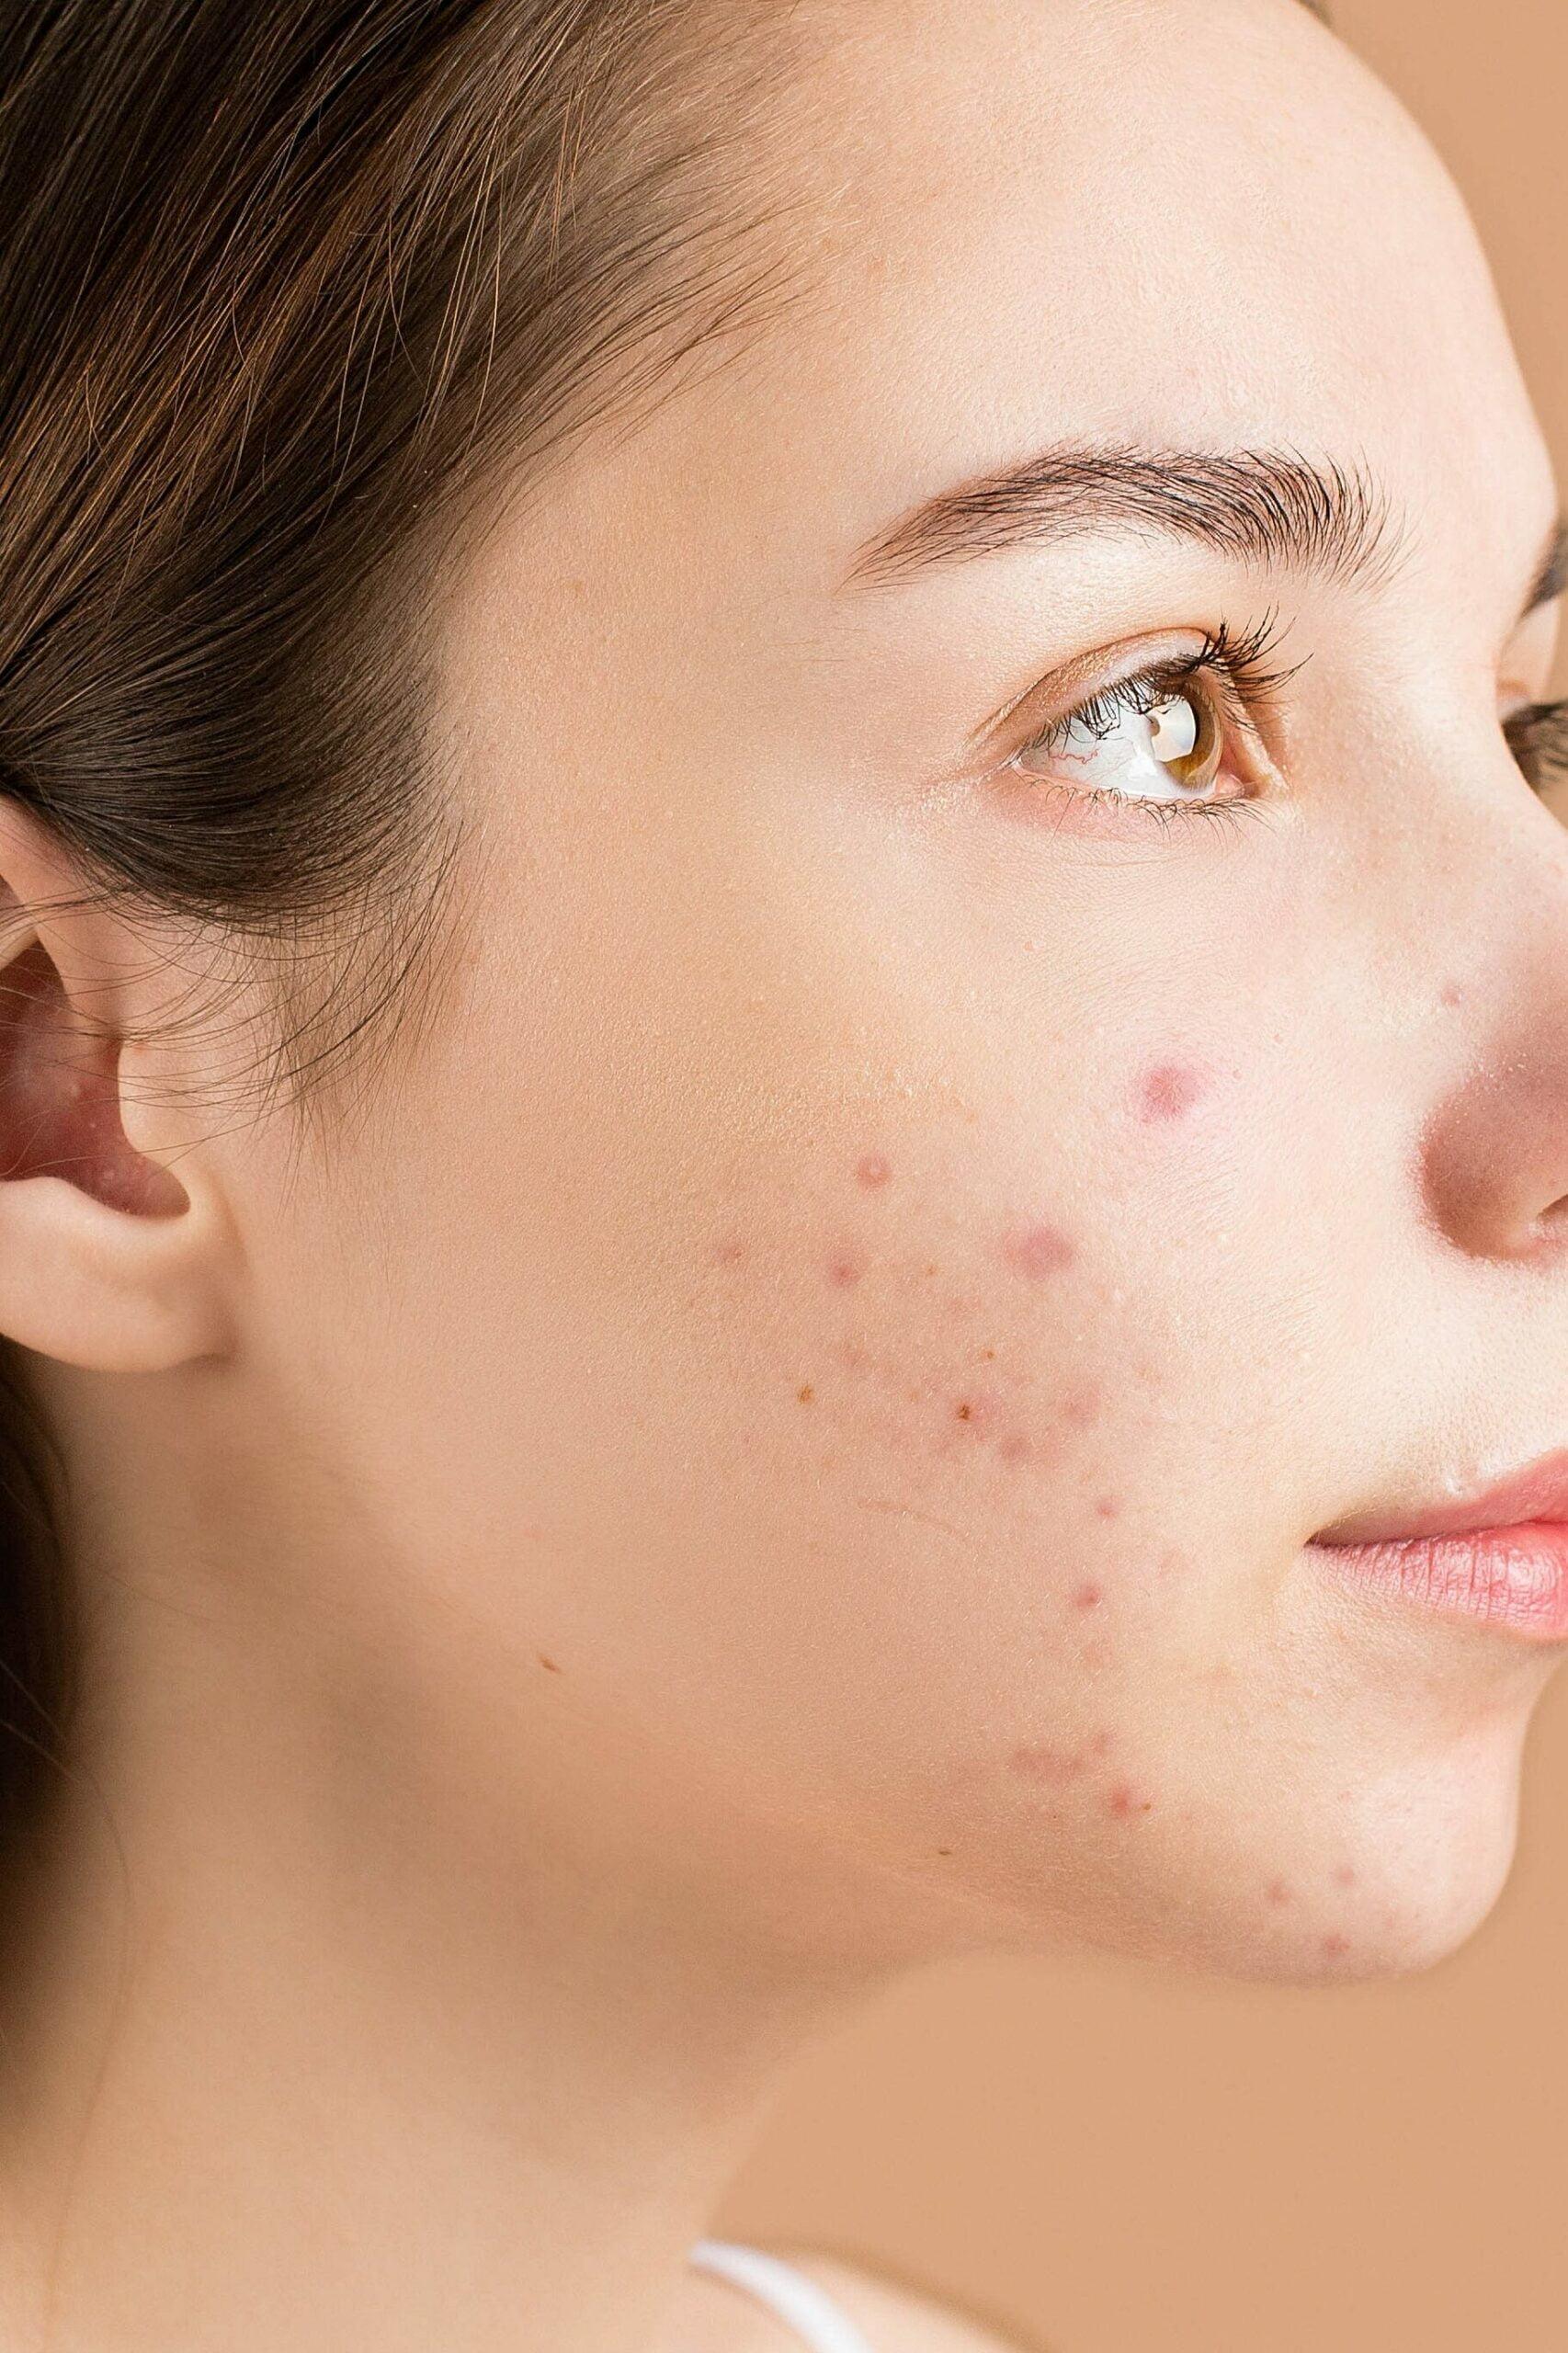 malassezia folliculitis on the face